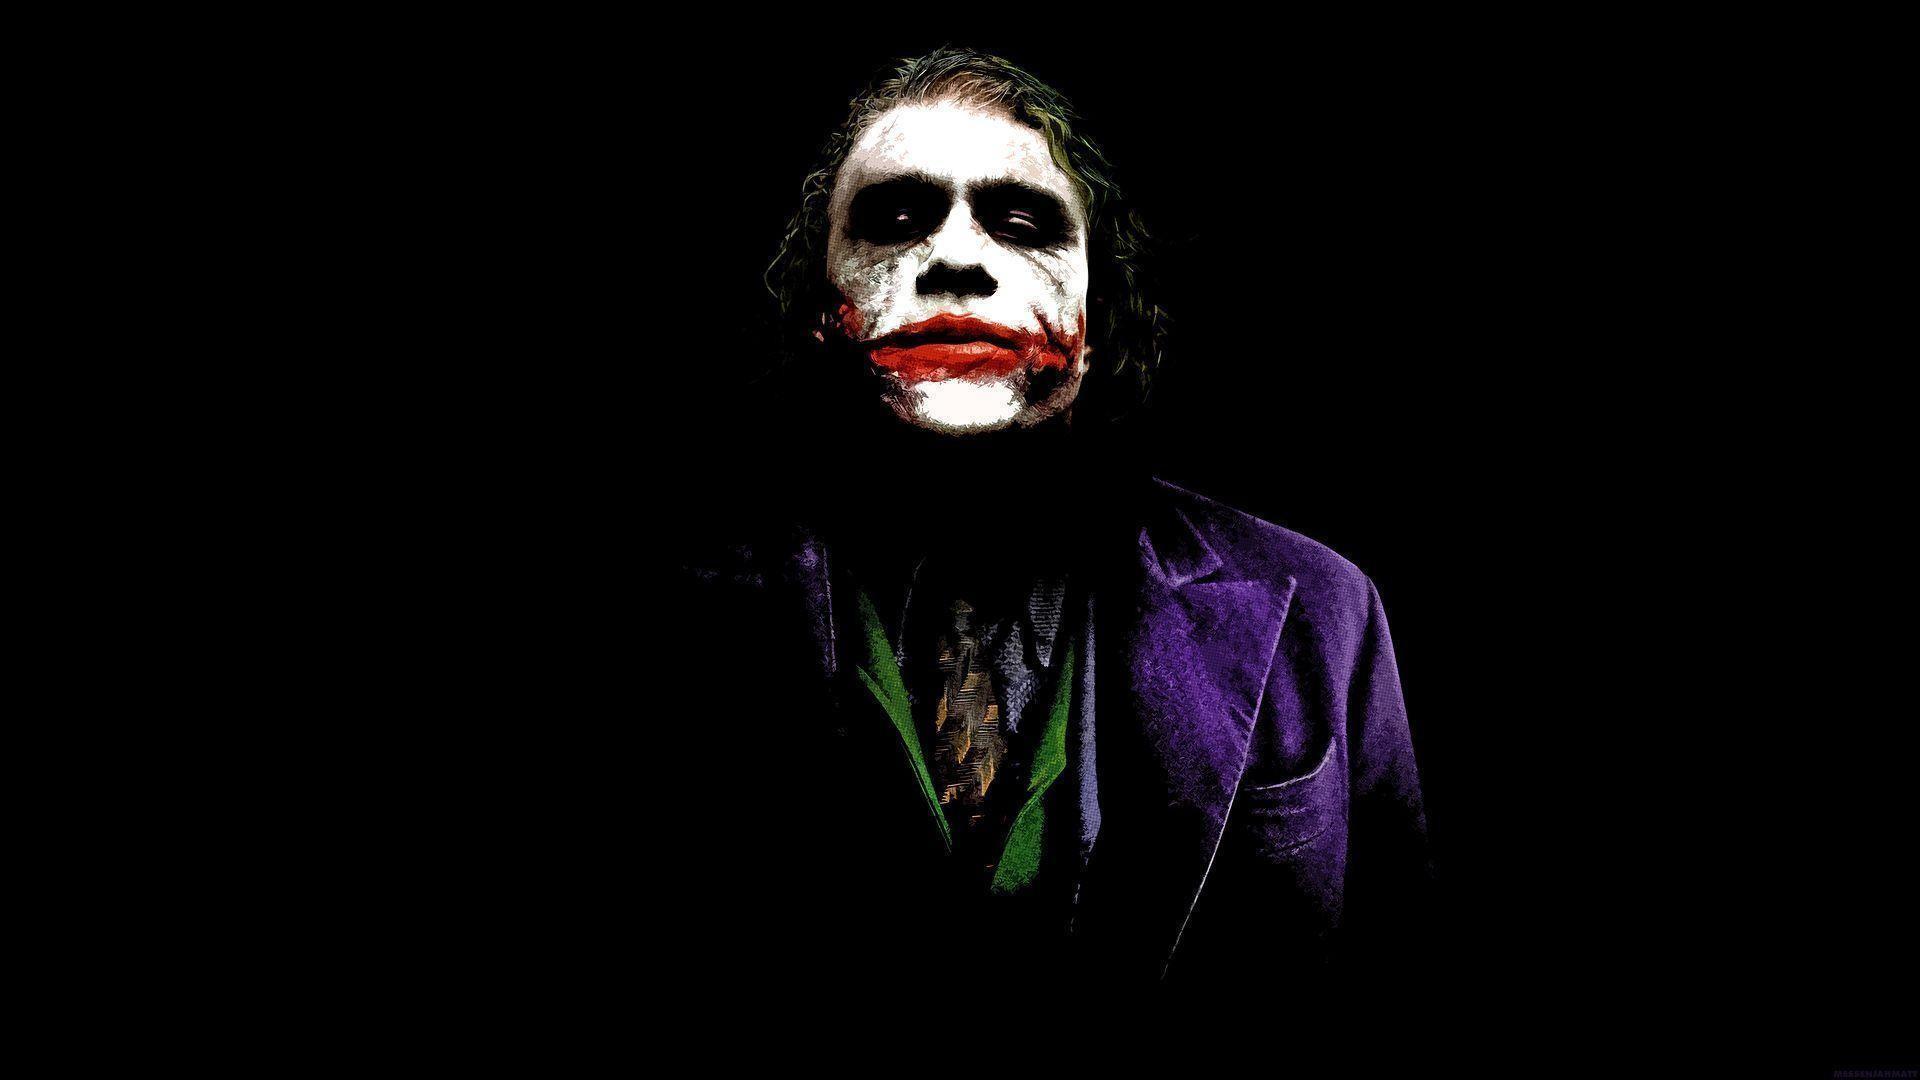 1920x1080 Movie Joker Wallpaper For Desktop 14 HD Wallpapers | aladdino.